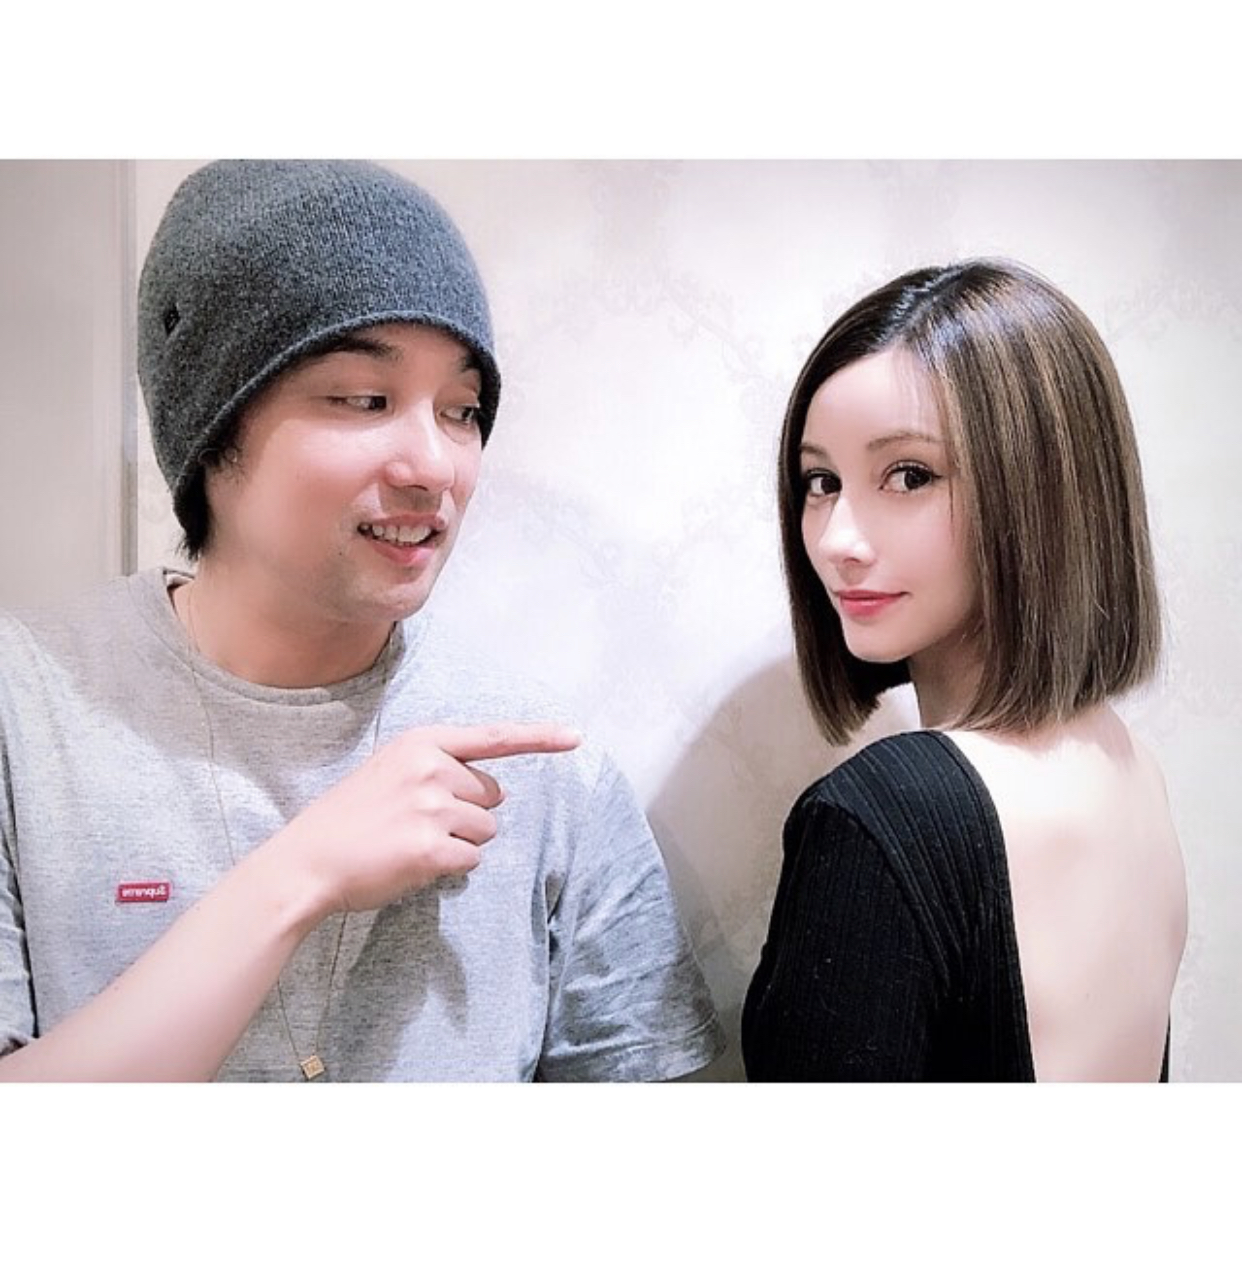 Akemi Darenogare debuts Rola-esque short hair